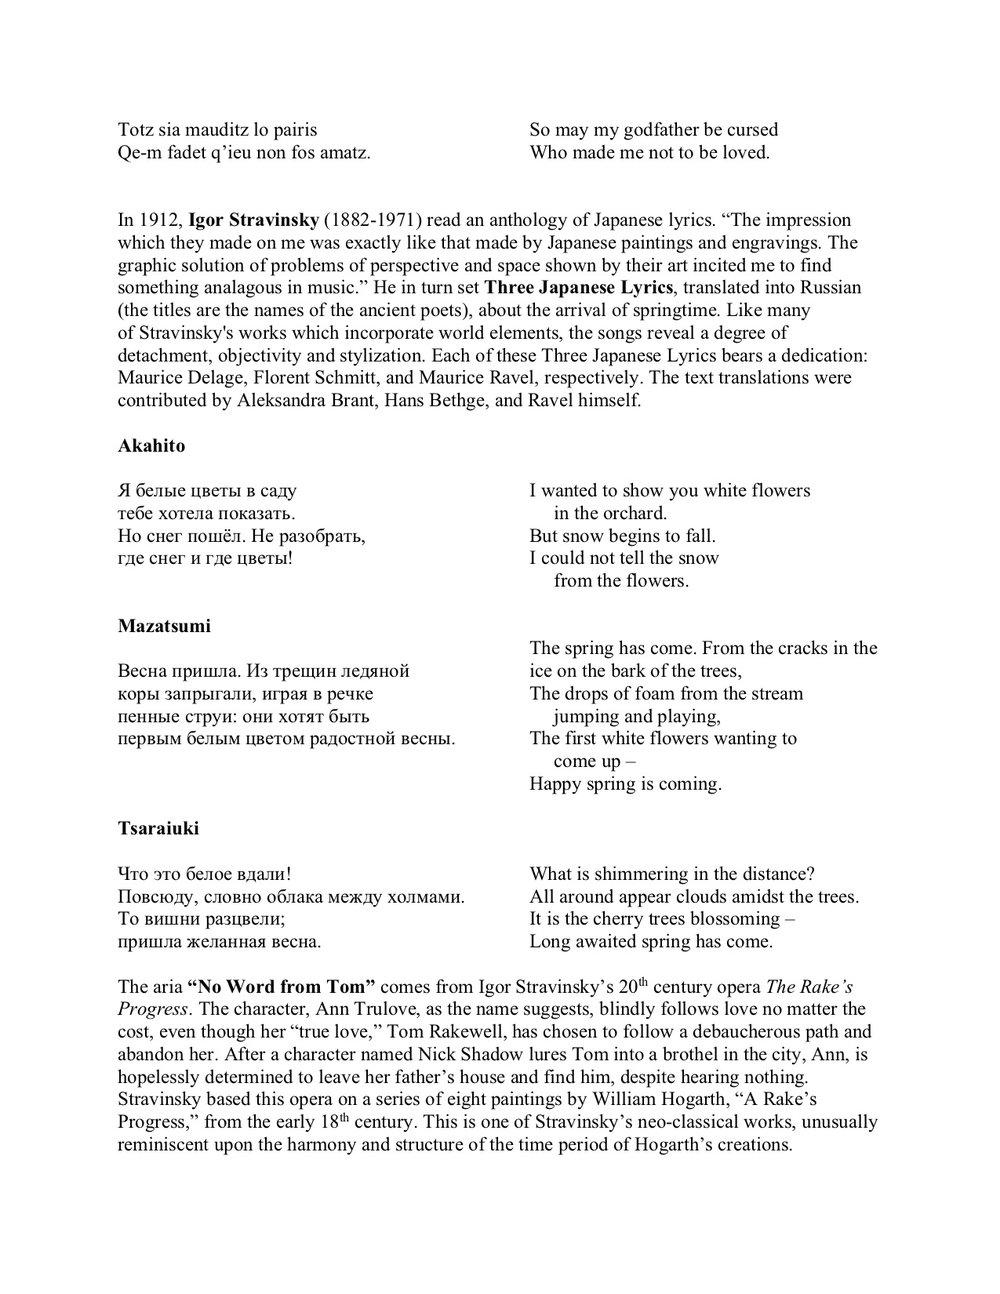 Graduate Recital Program Notes pg.5.jpg